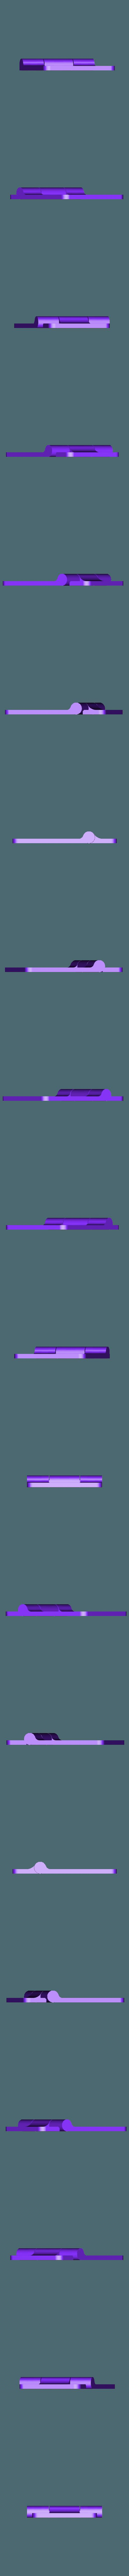 AMF_FumeBlower.stl Download free STL file Laser Fume Blower support • 3D printing template, dancingchicken